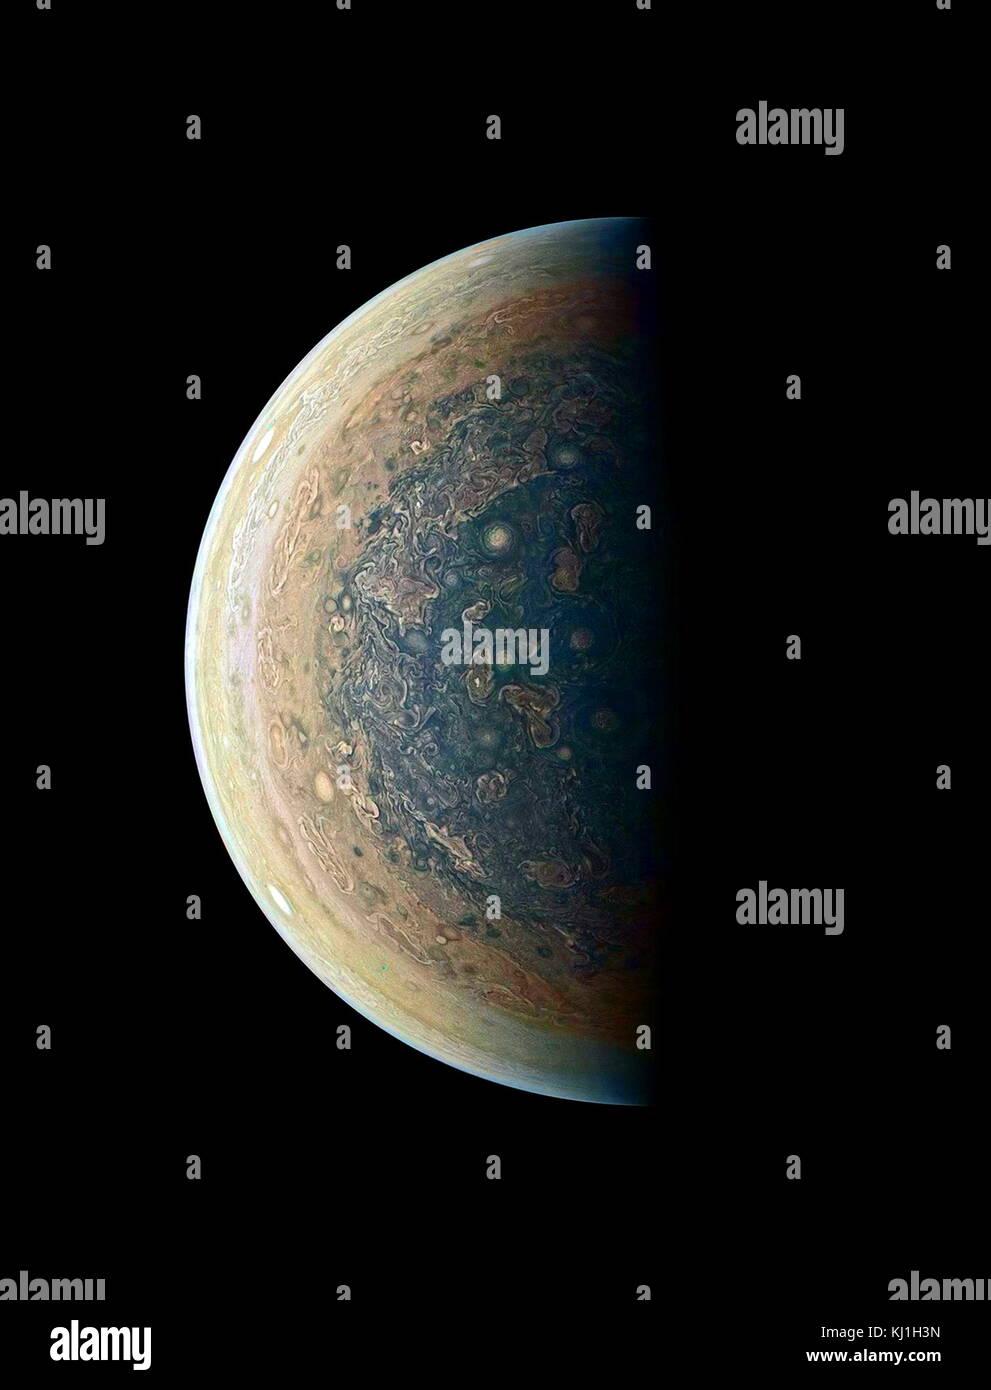 photo of Jupiter's south polar region, captured by the JunoCam imager on NASA's Juno Orbiter on Feb. 2, 2017 reveals - Stock Image